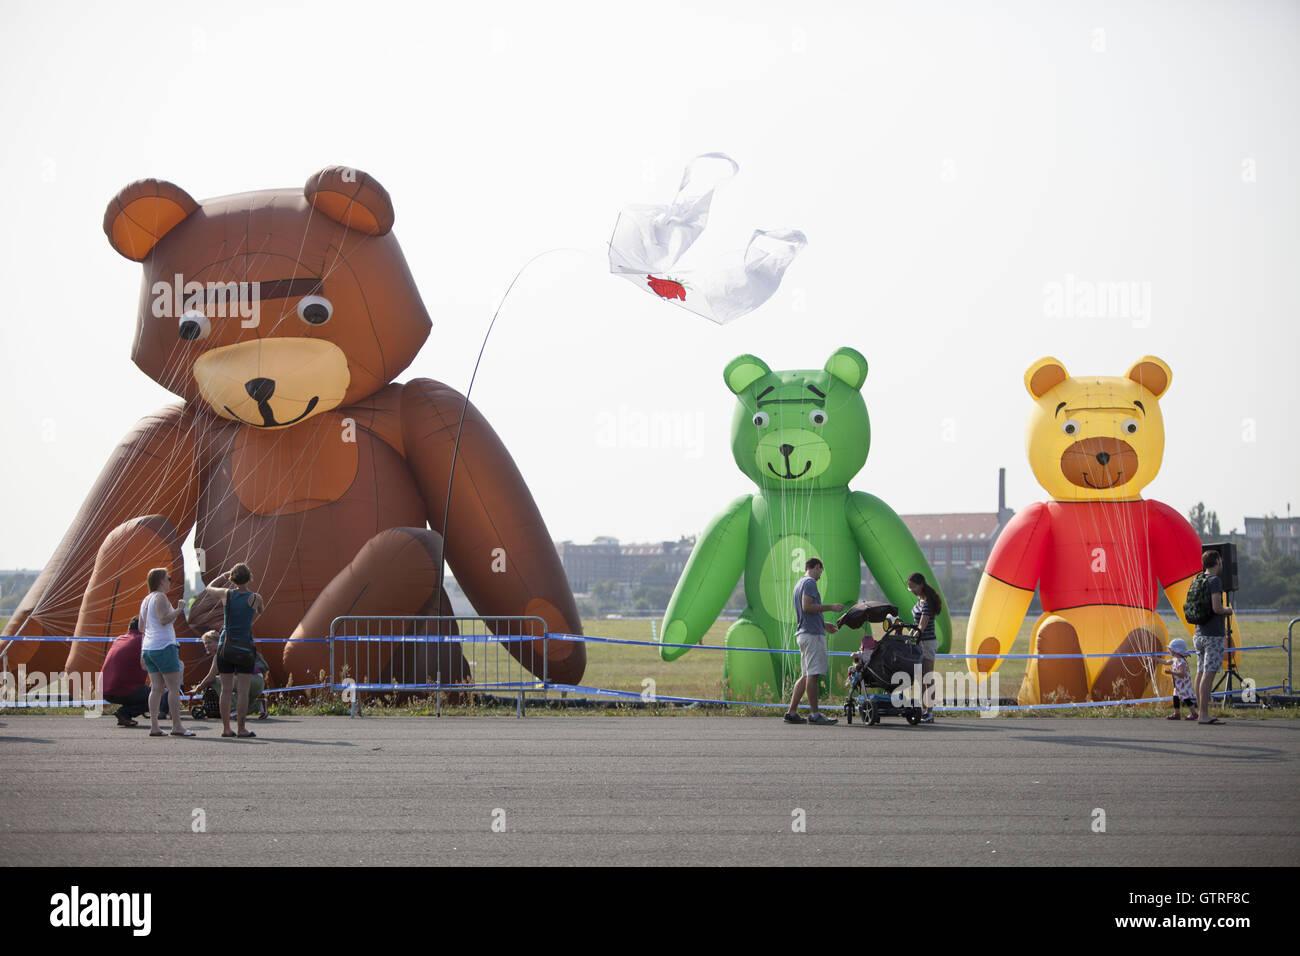 Berlin, Germany. 10th Sep, 2016. Kite festival at tempelhofer feld in Berlin. Credit:  Omer Messinger/ZUMA Wire/Alamy - Stock Image